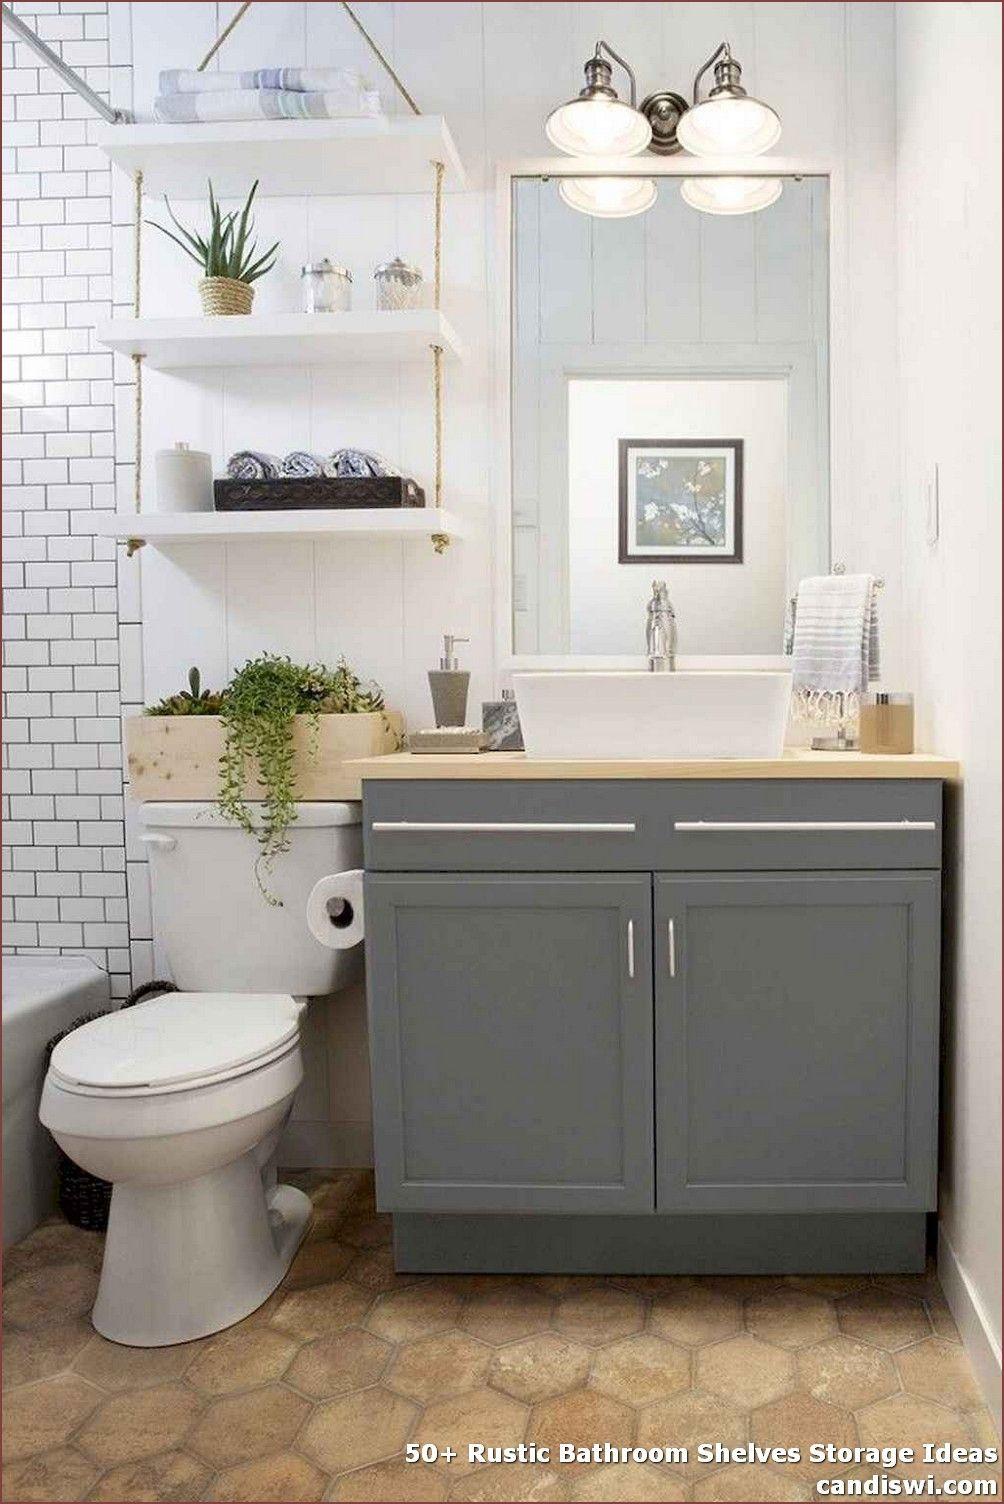 50 Rustic Bathroom Shelves Storage Ideas Bathroom Design Small Bathroom Storage Small Bathroom Remodel [ 1504 x 1004 Pixel ]